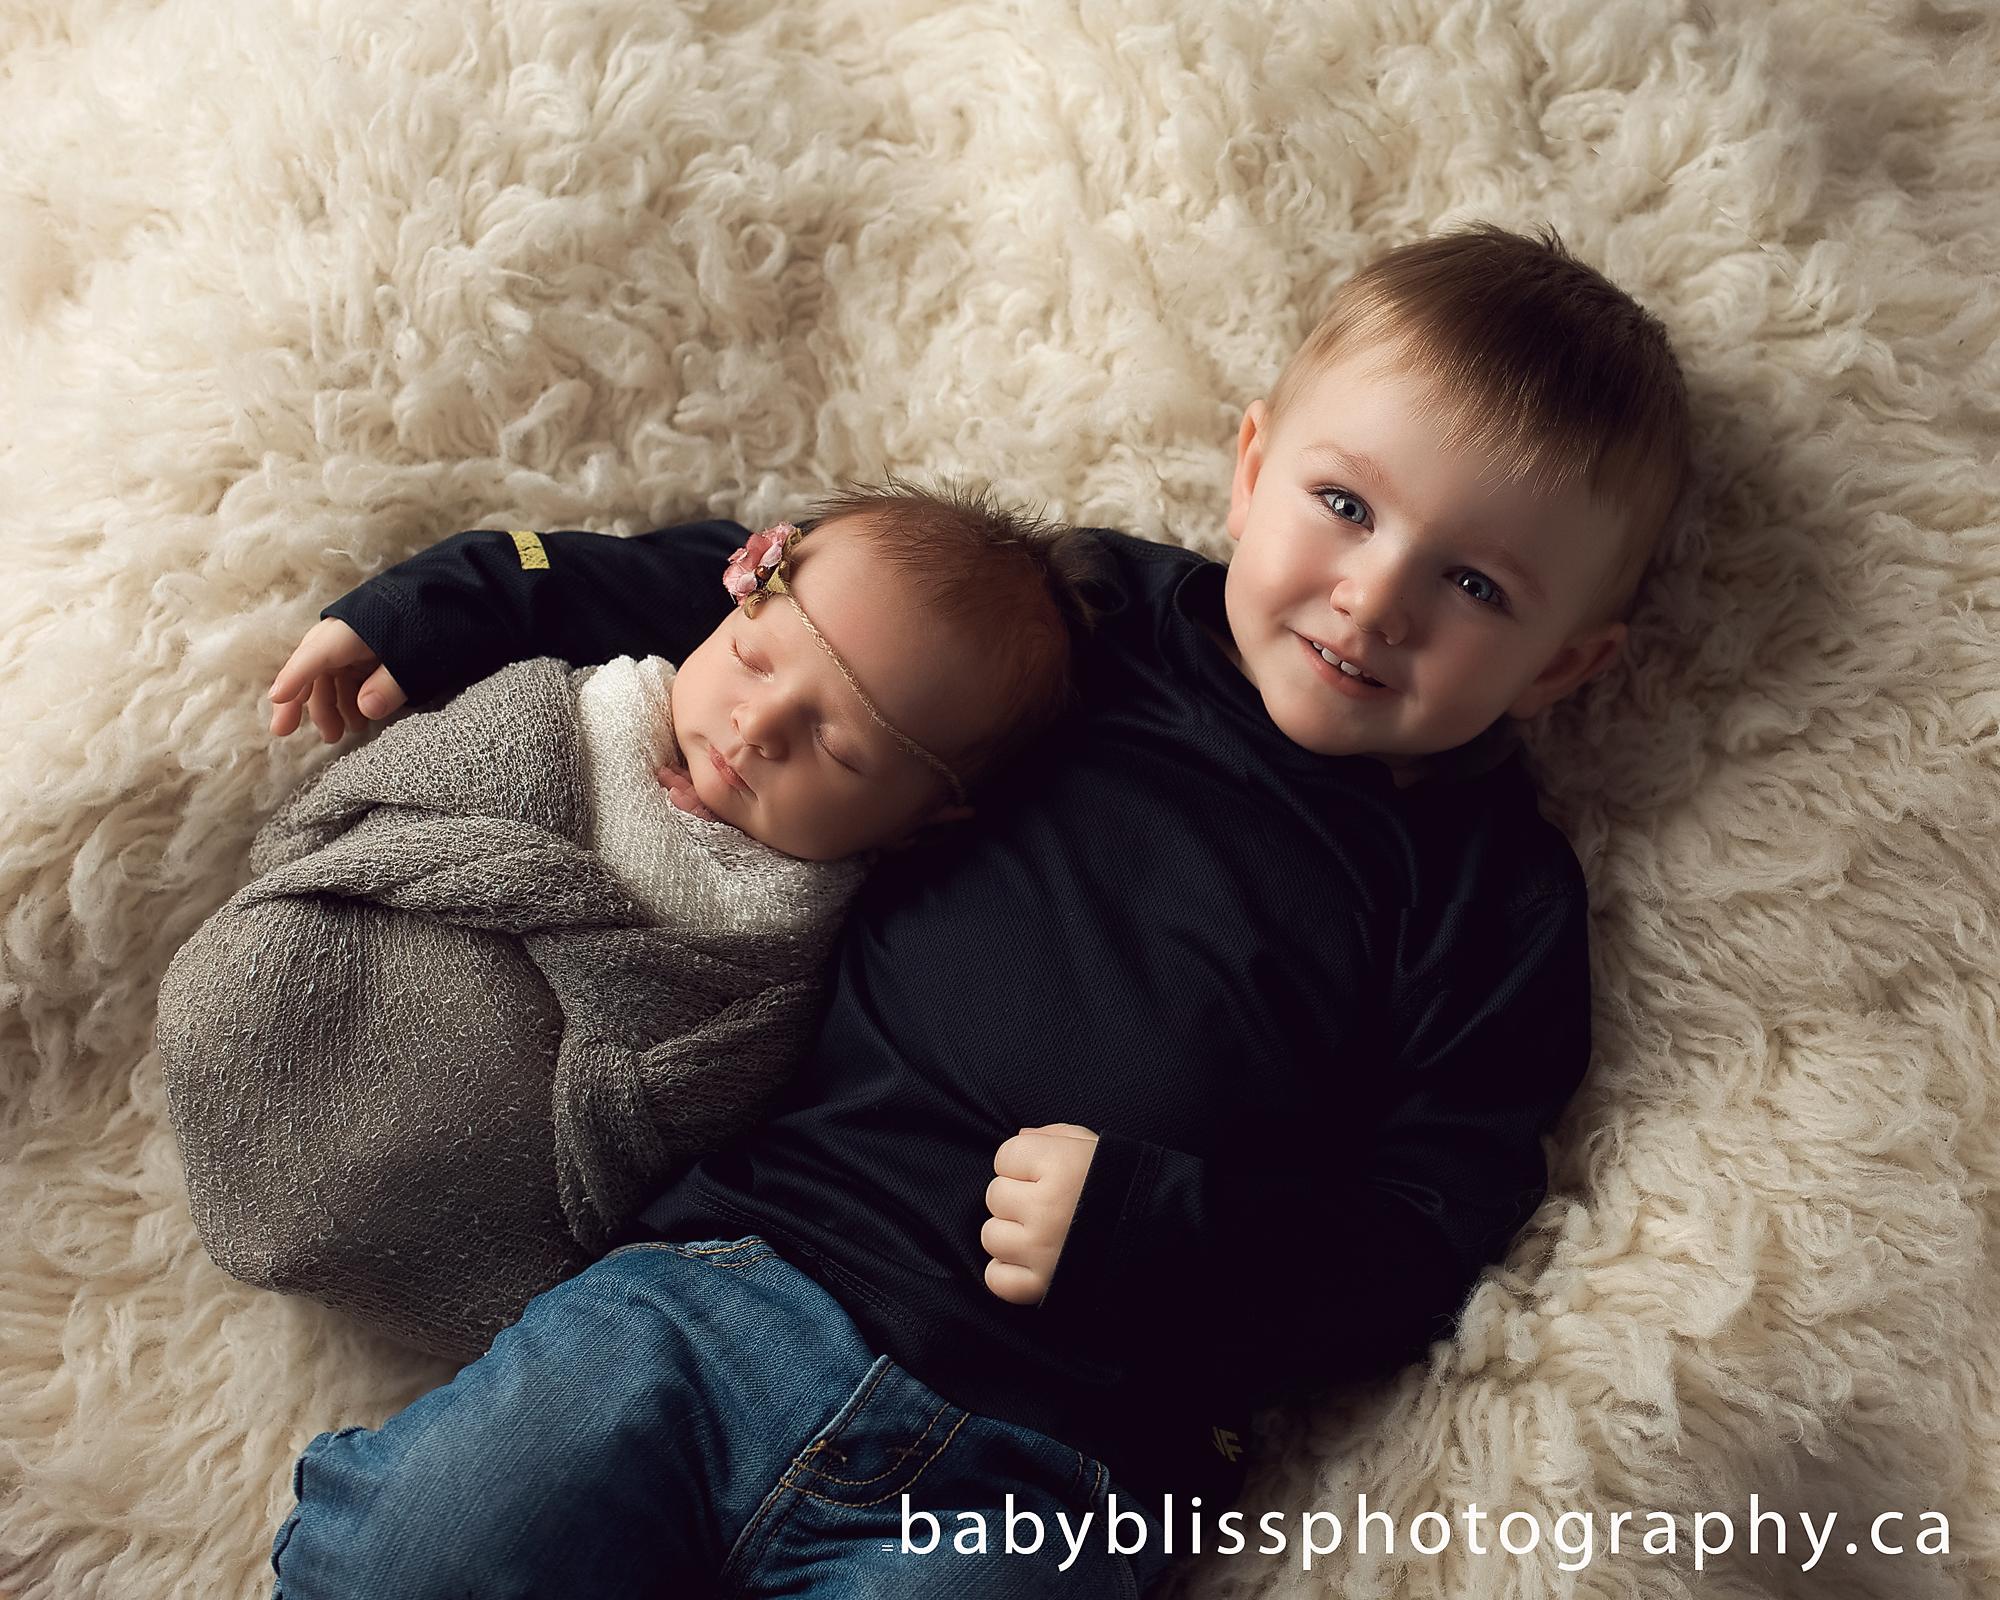 Salmon Arm Newborn Photography | Baby Bliss Photography | www.babyblissphotography.ca